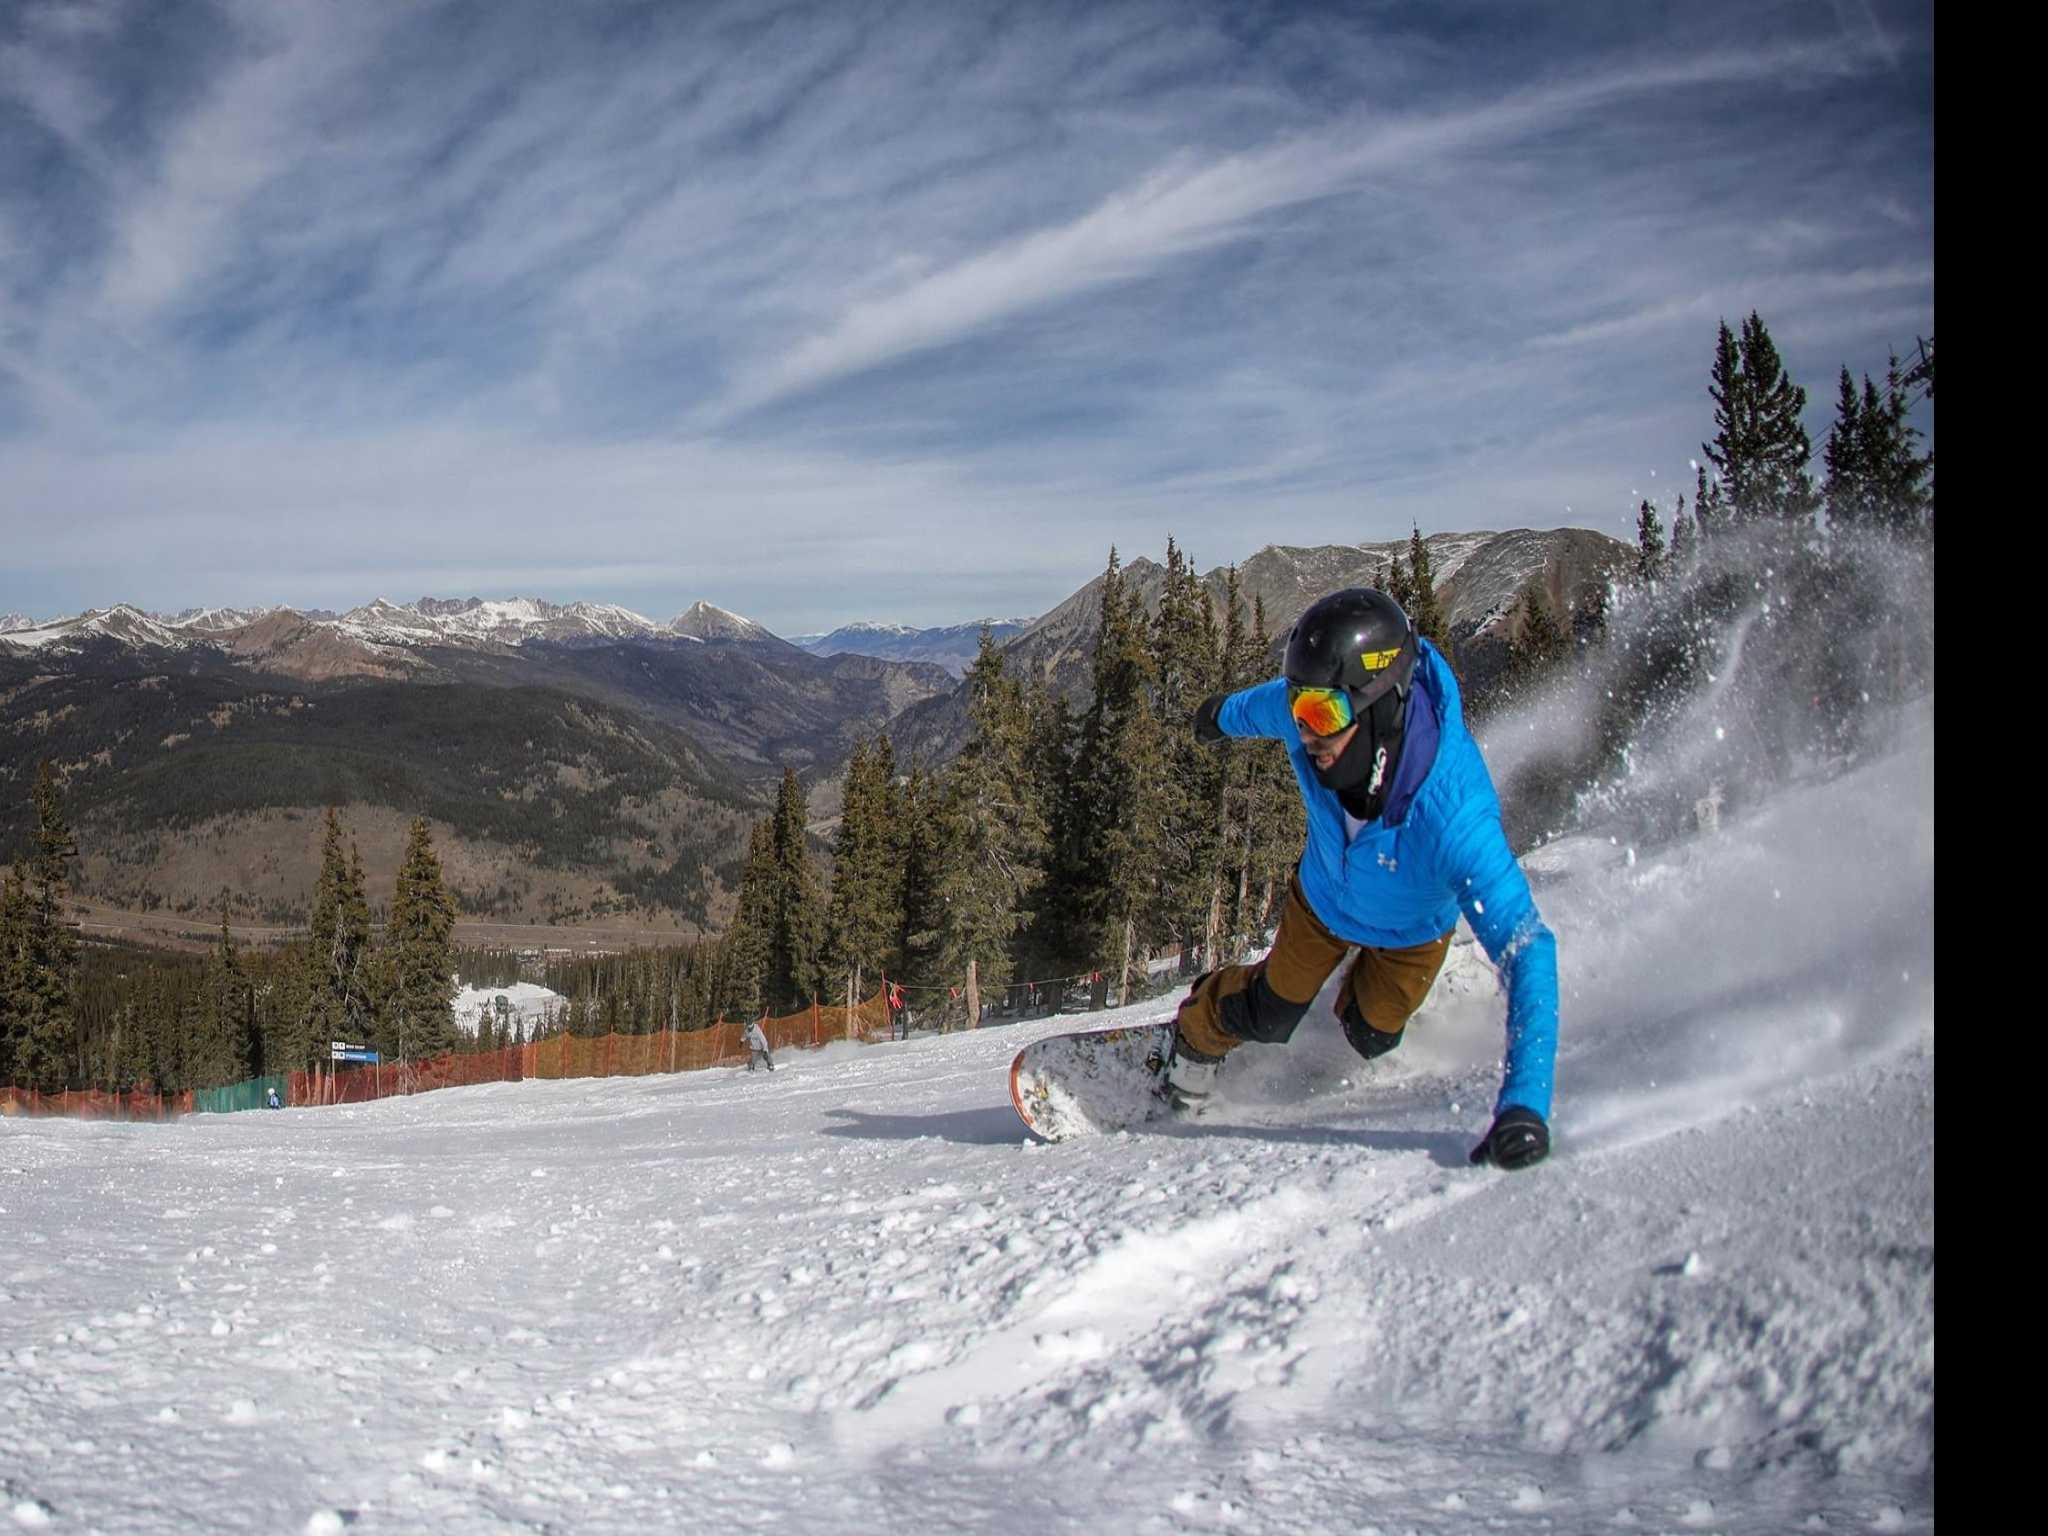 Colorado Ski Season: Mountain Oysters, Olympic Fun & More